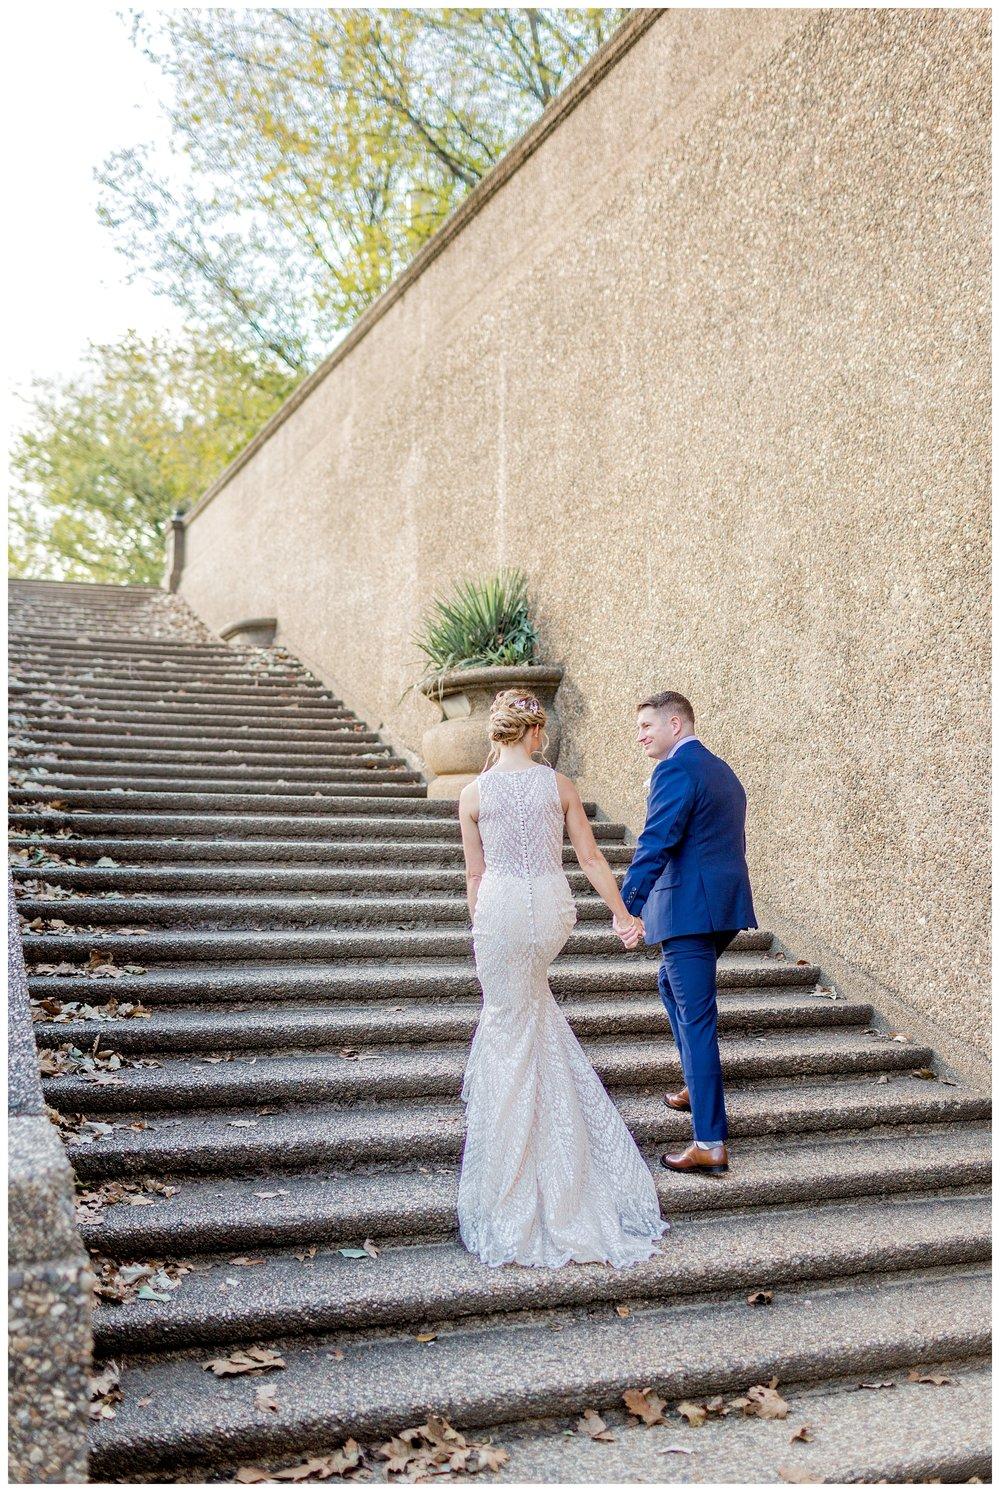 Meridian Hill Park Wedding | Washington DC Wedding Photographer Kir Tuben_0053.jpg